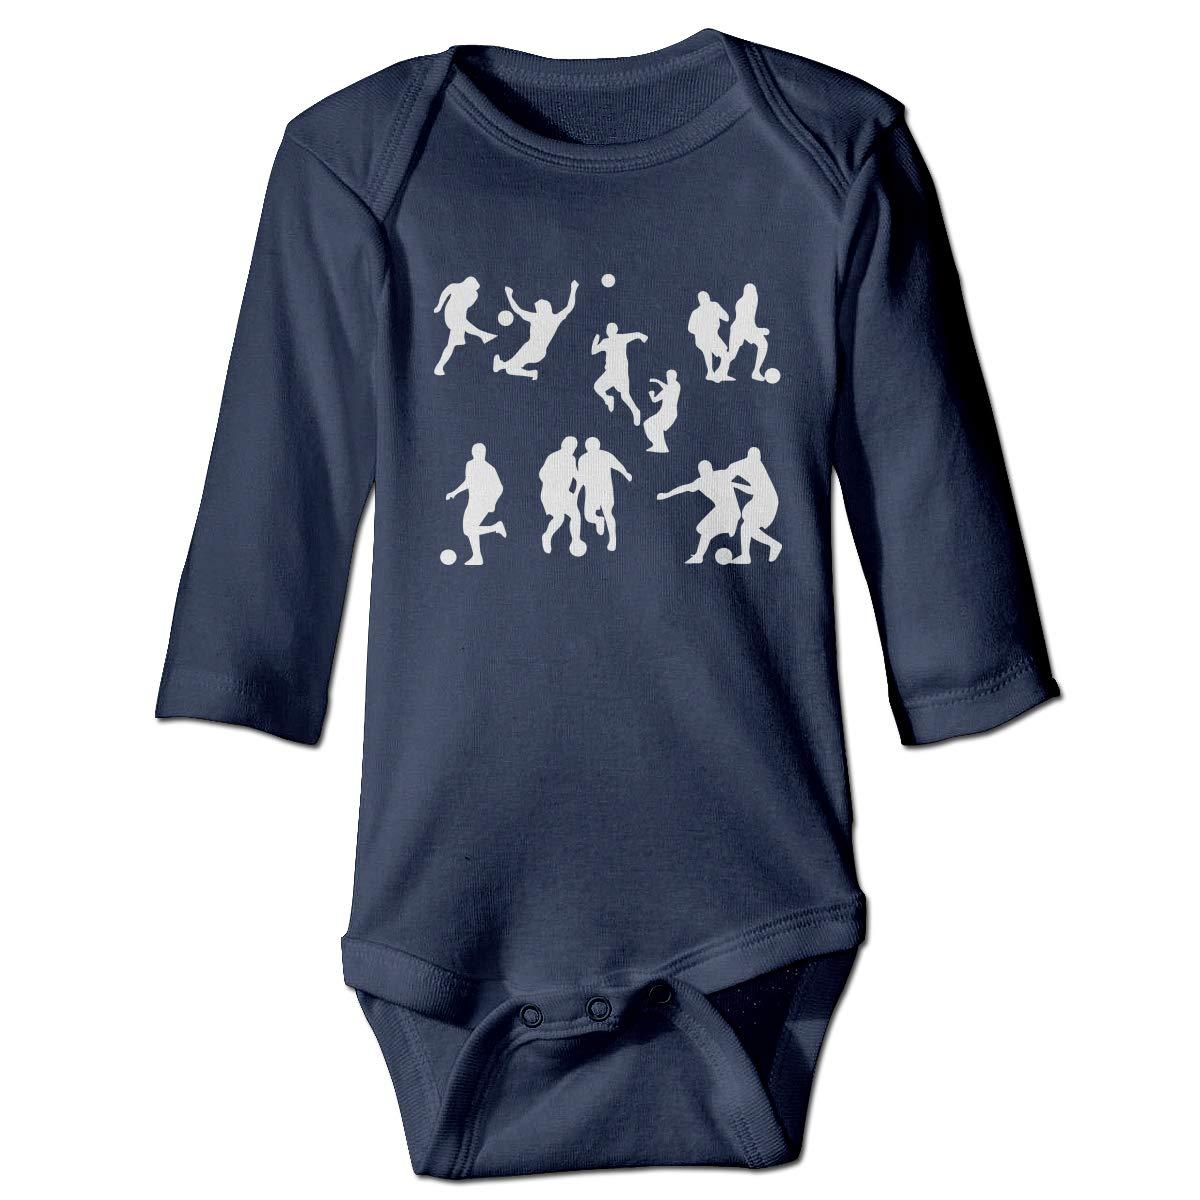 Just Born Baby Boys Girls Romper Bodysuit Infant Football Player Silhouette1 Long Sleeve Funny Climb Romper